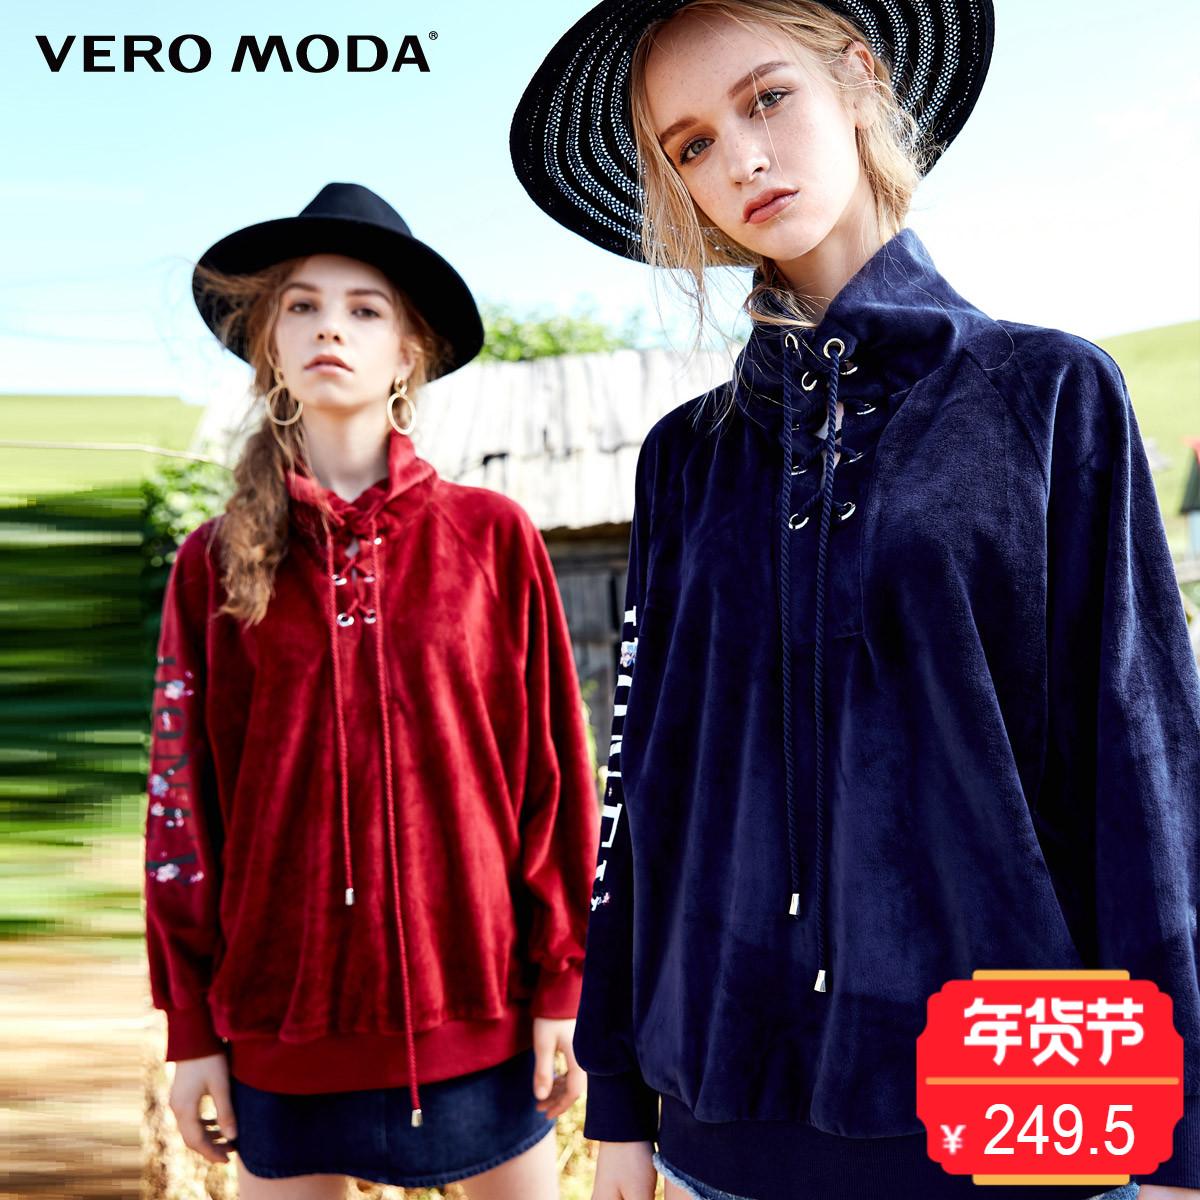 Vero+Moda品牌口碑如何,买过Vero+Moda丝绒卫衣的觉得怎么样